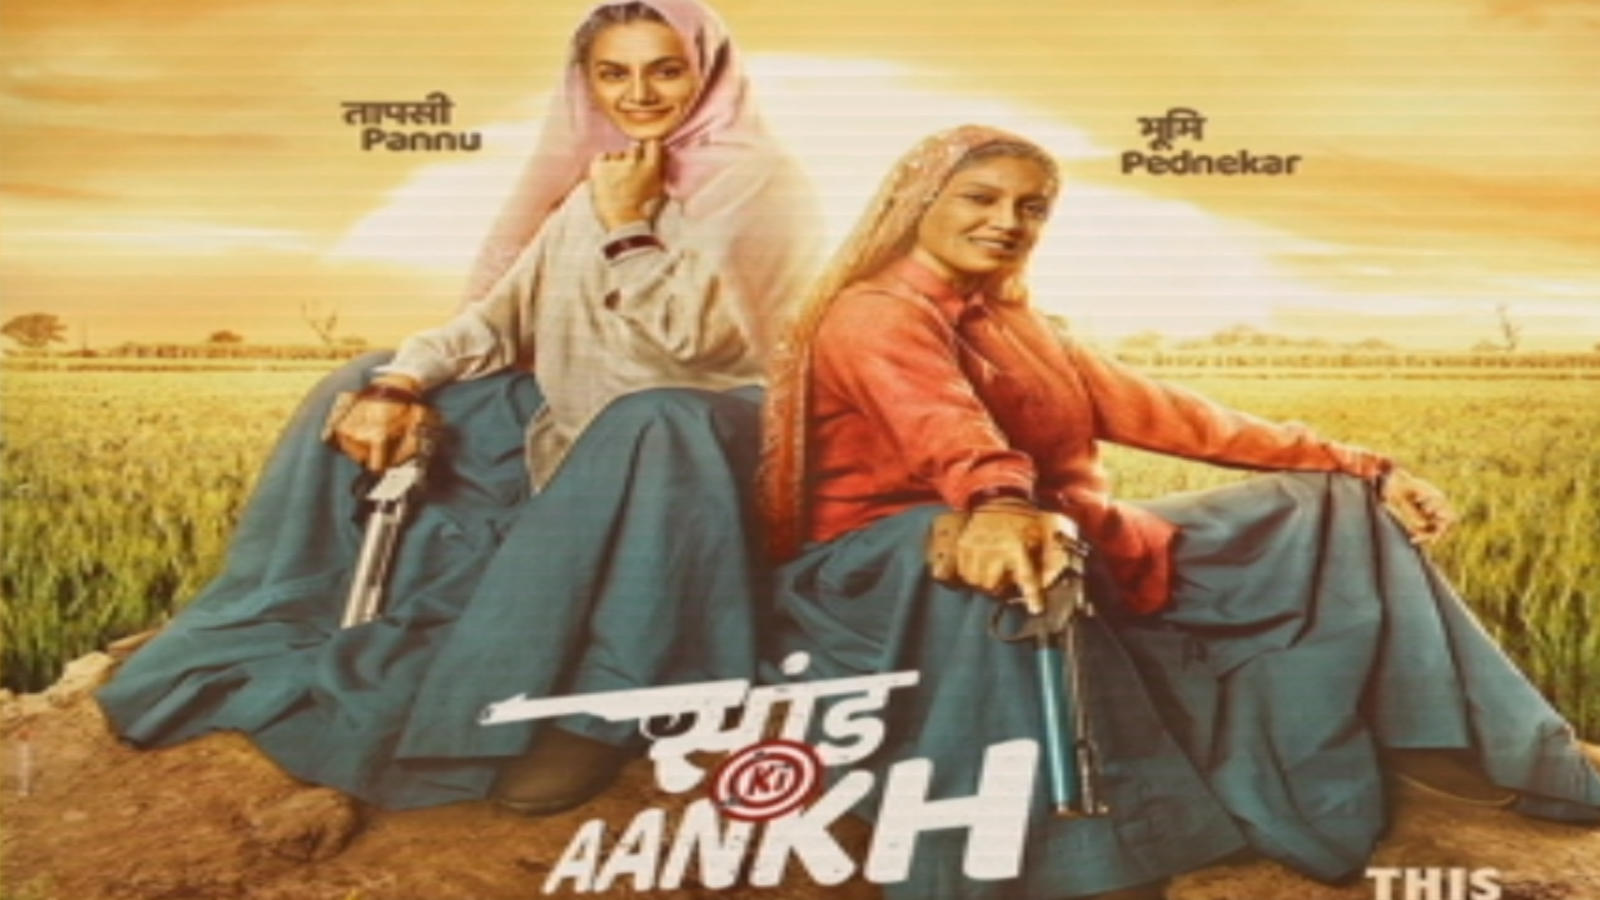 Bhumi Pednekar and Taapsee Pannu hit bull's eye in 'Saand Ki Aankh' teaser